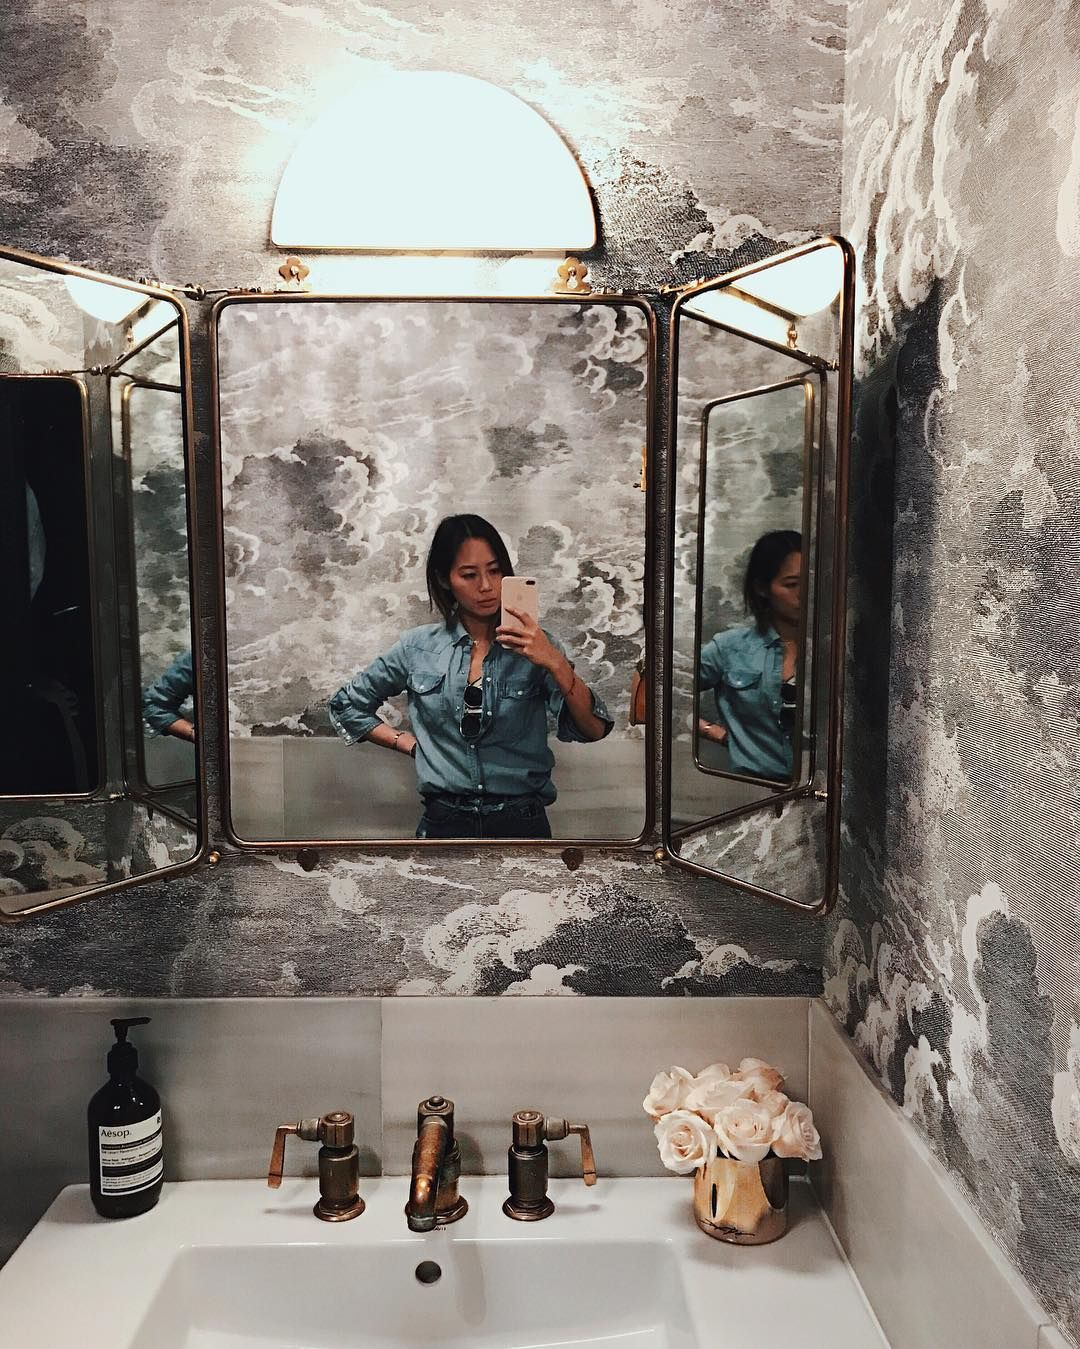 Best Photo Gallery Websites Aimee Song songofstyle u Instagram photos and videos